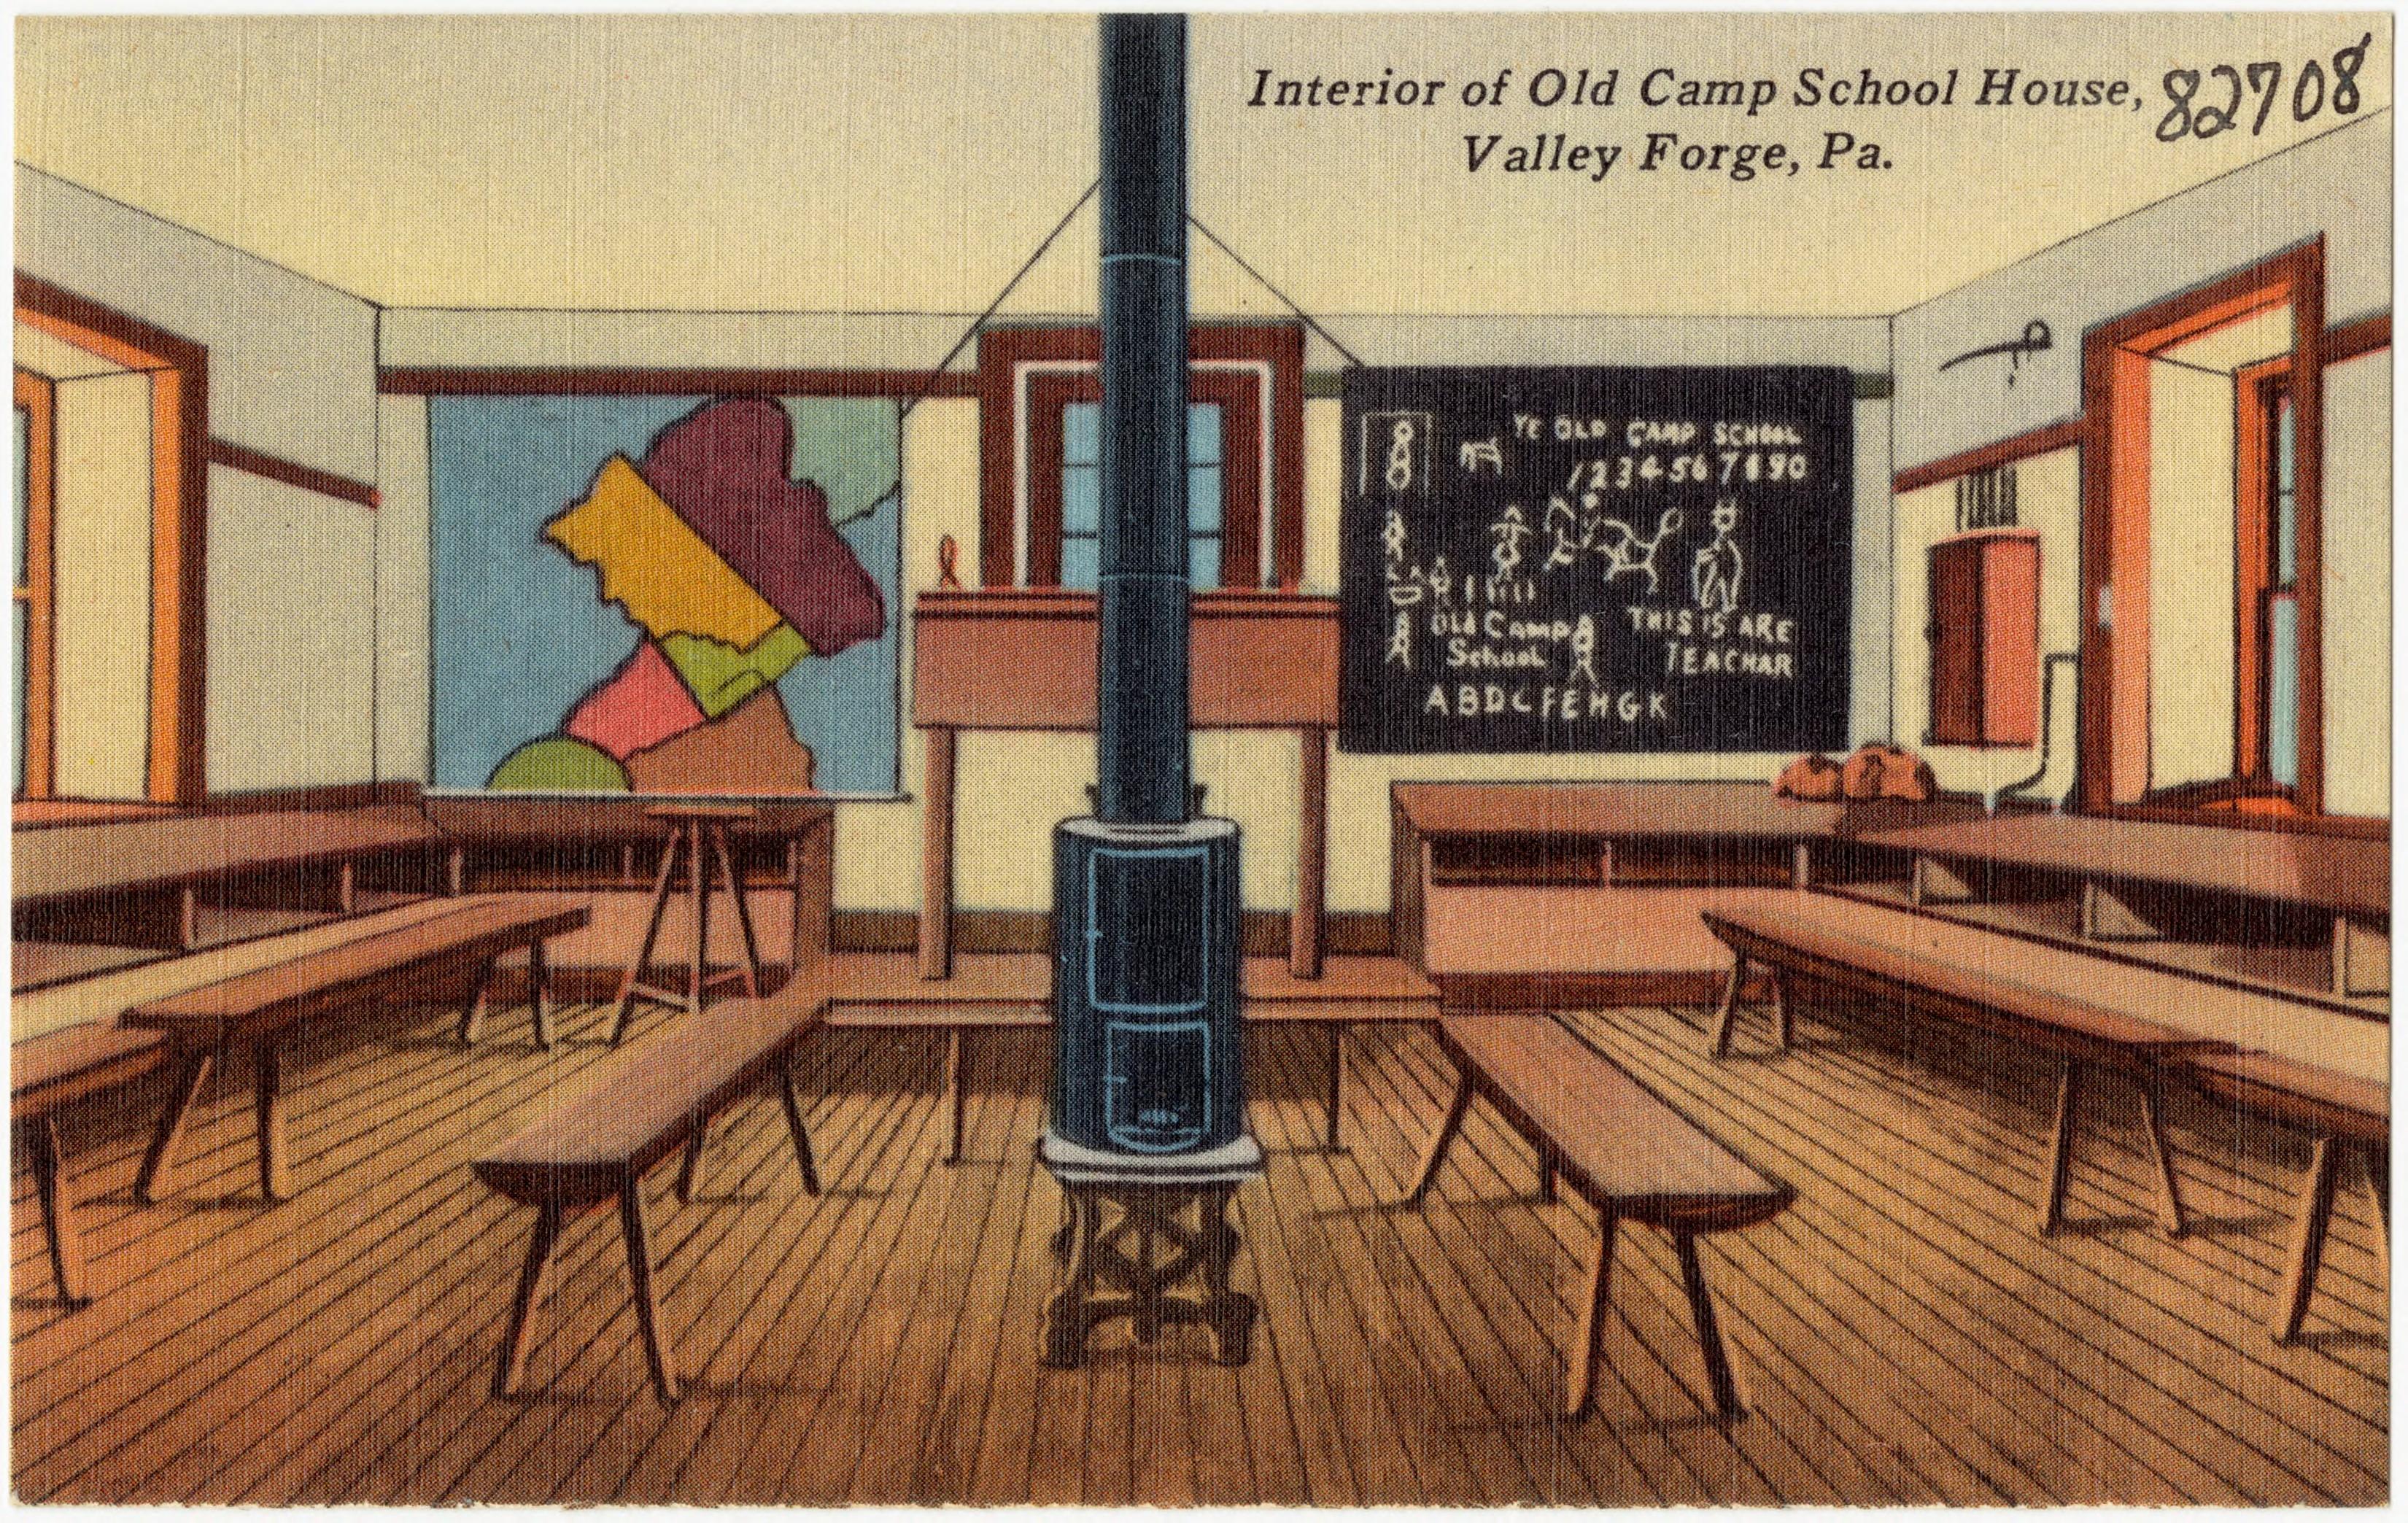 97 Interior Design Schools In Pa Our Beauty School In Allentown Pa More 14 Pennsylvania